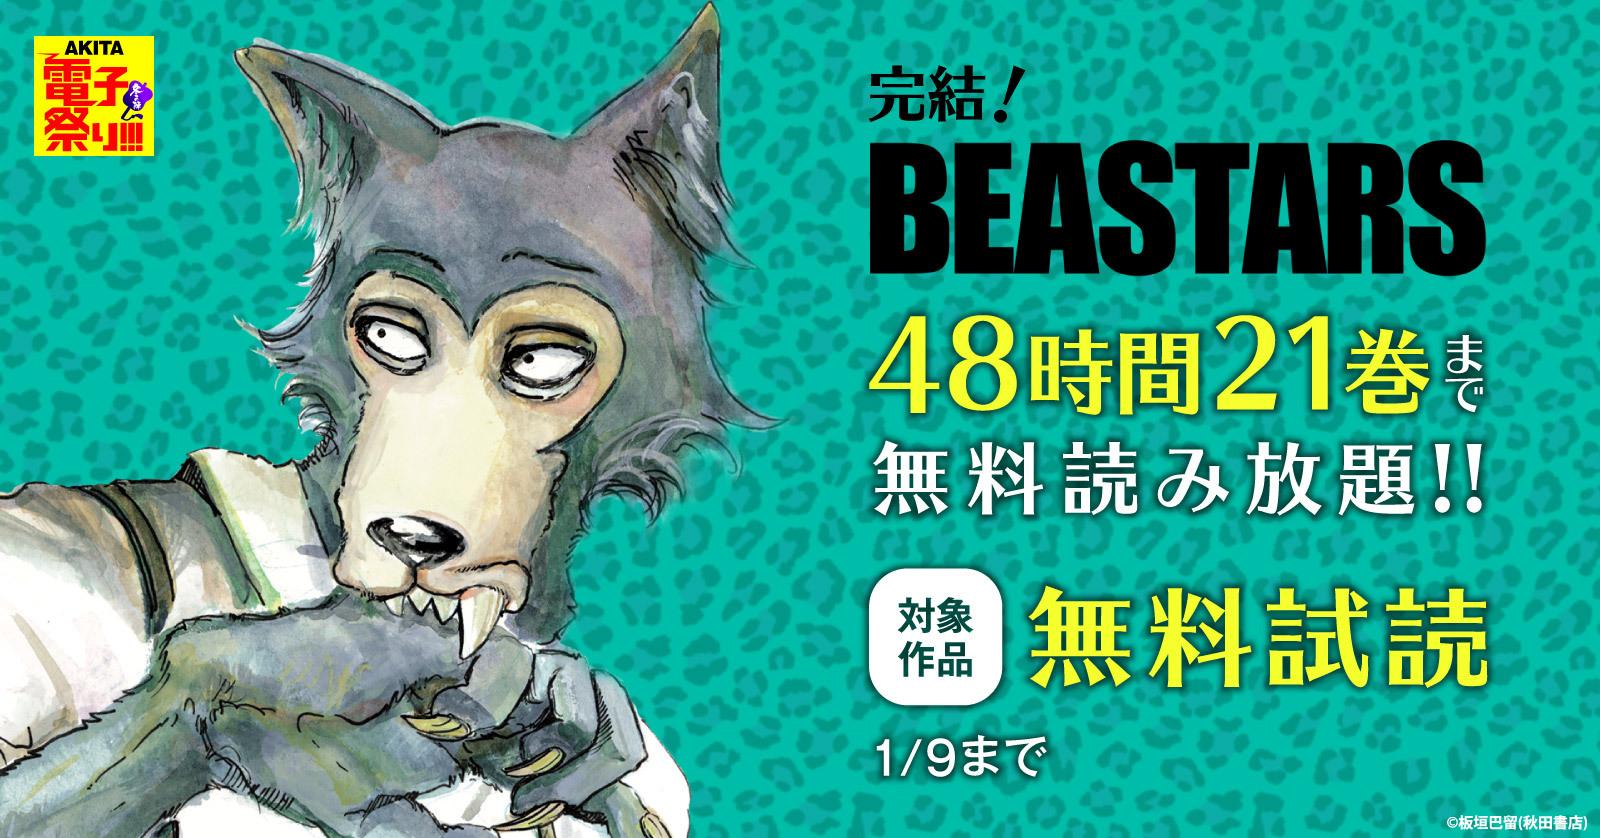 【AKITA電子祭り 冬の陣】第26弾 BEASTARS 完結! 48時間21巻まで無料読み放題